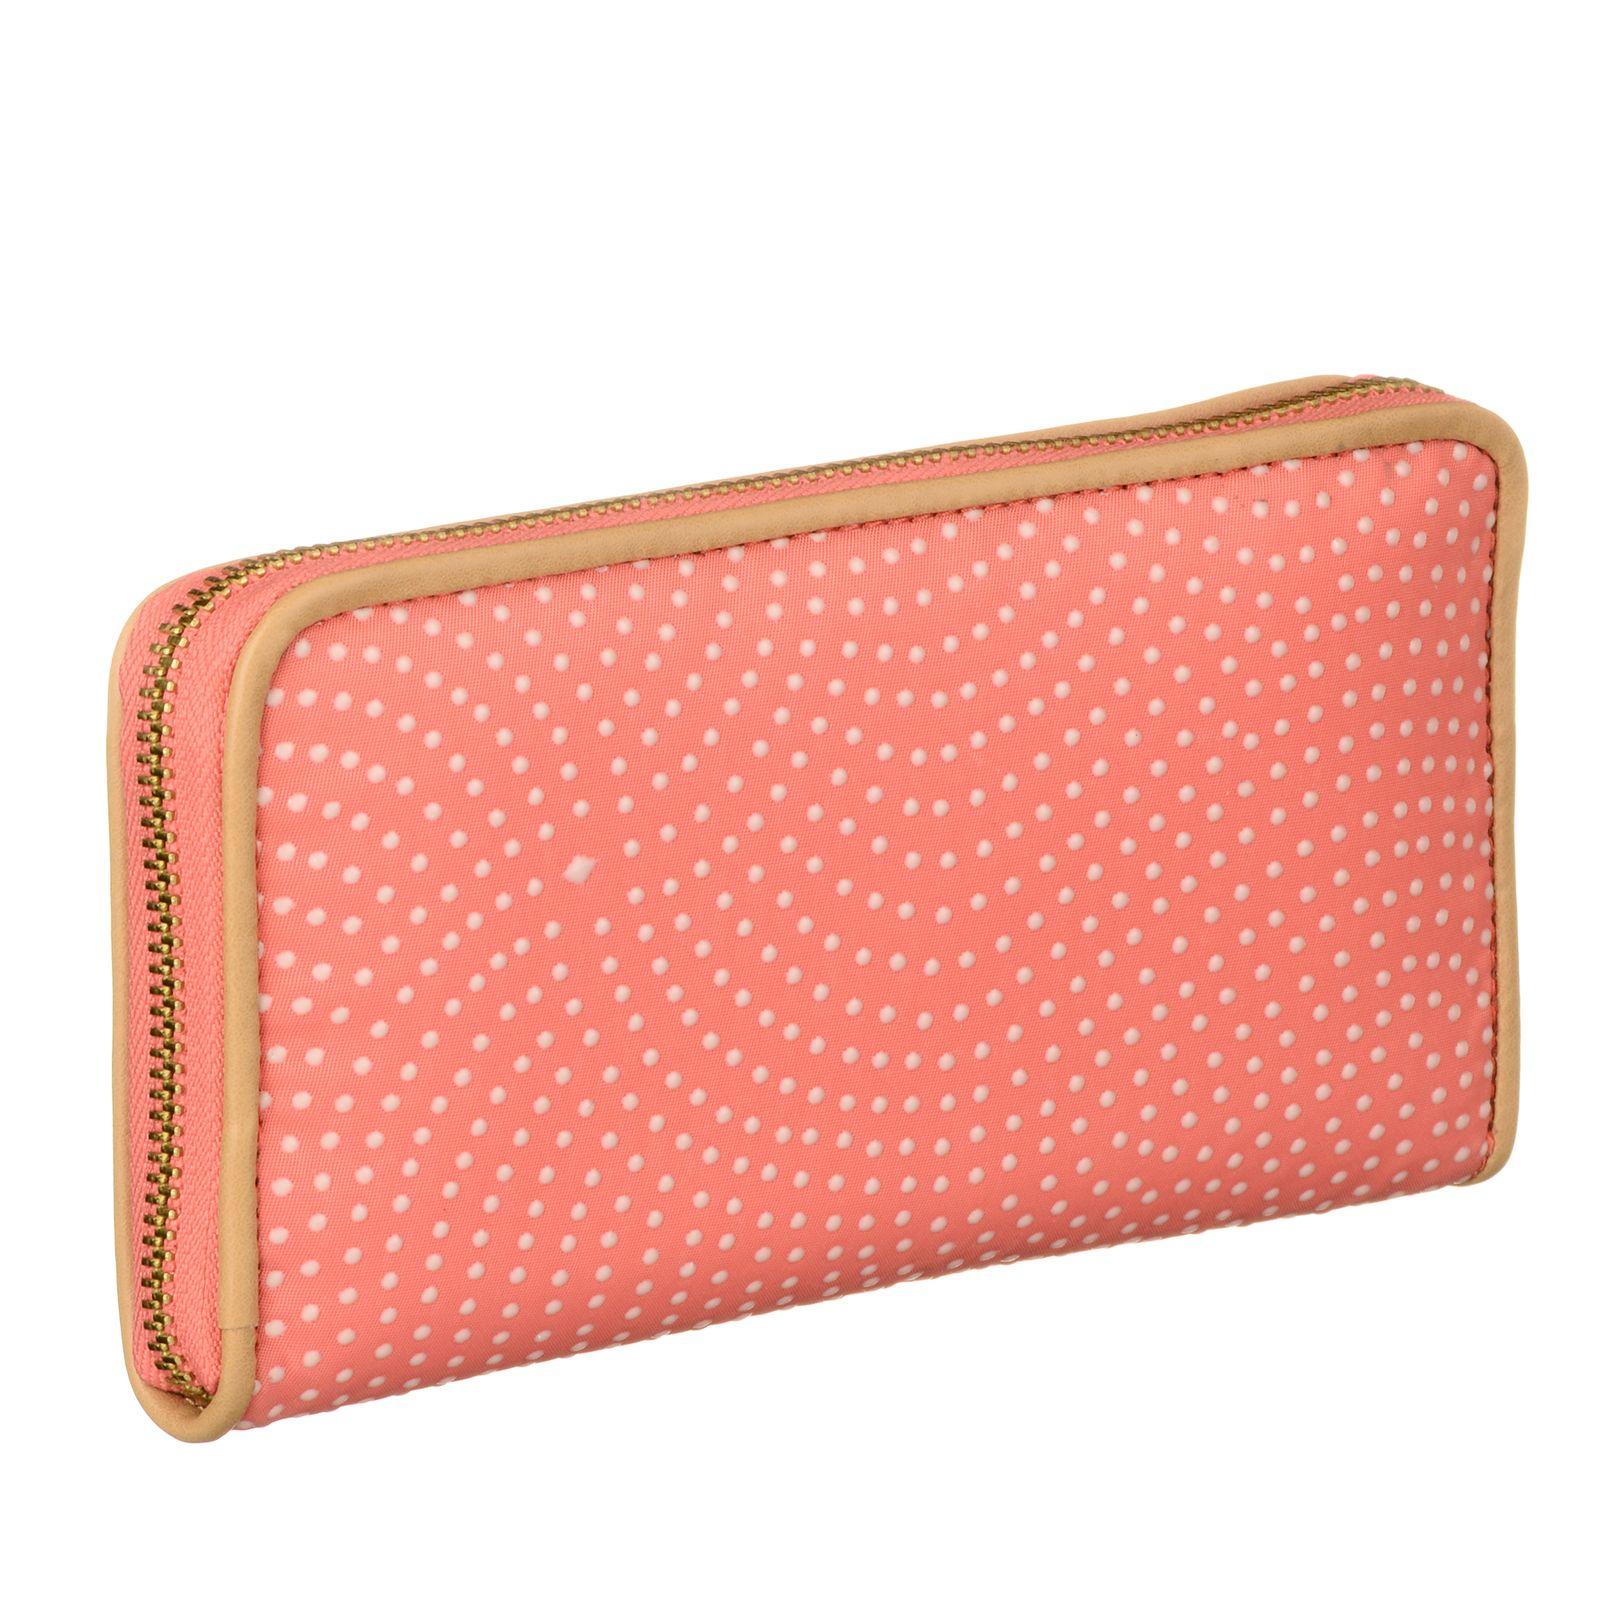 45274680cbc4 Oilily Swipe L Zip Wallet Pink Flamingo